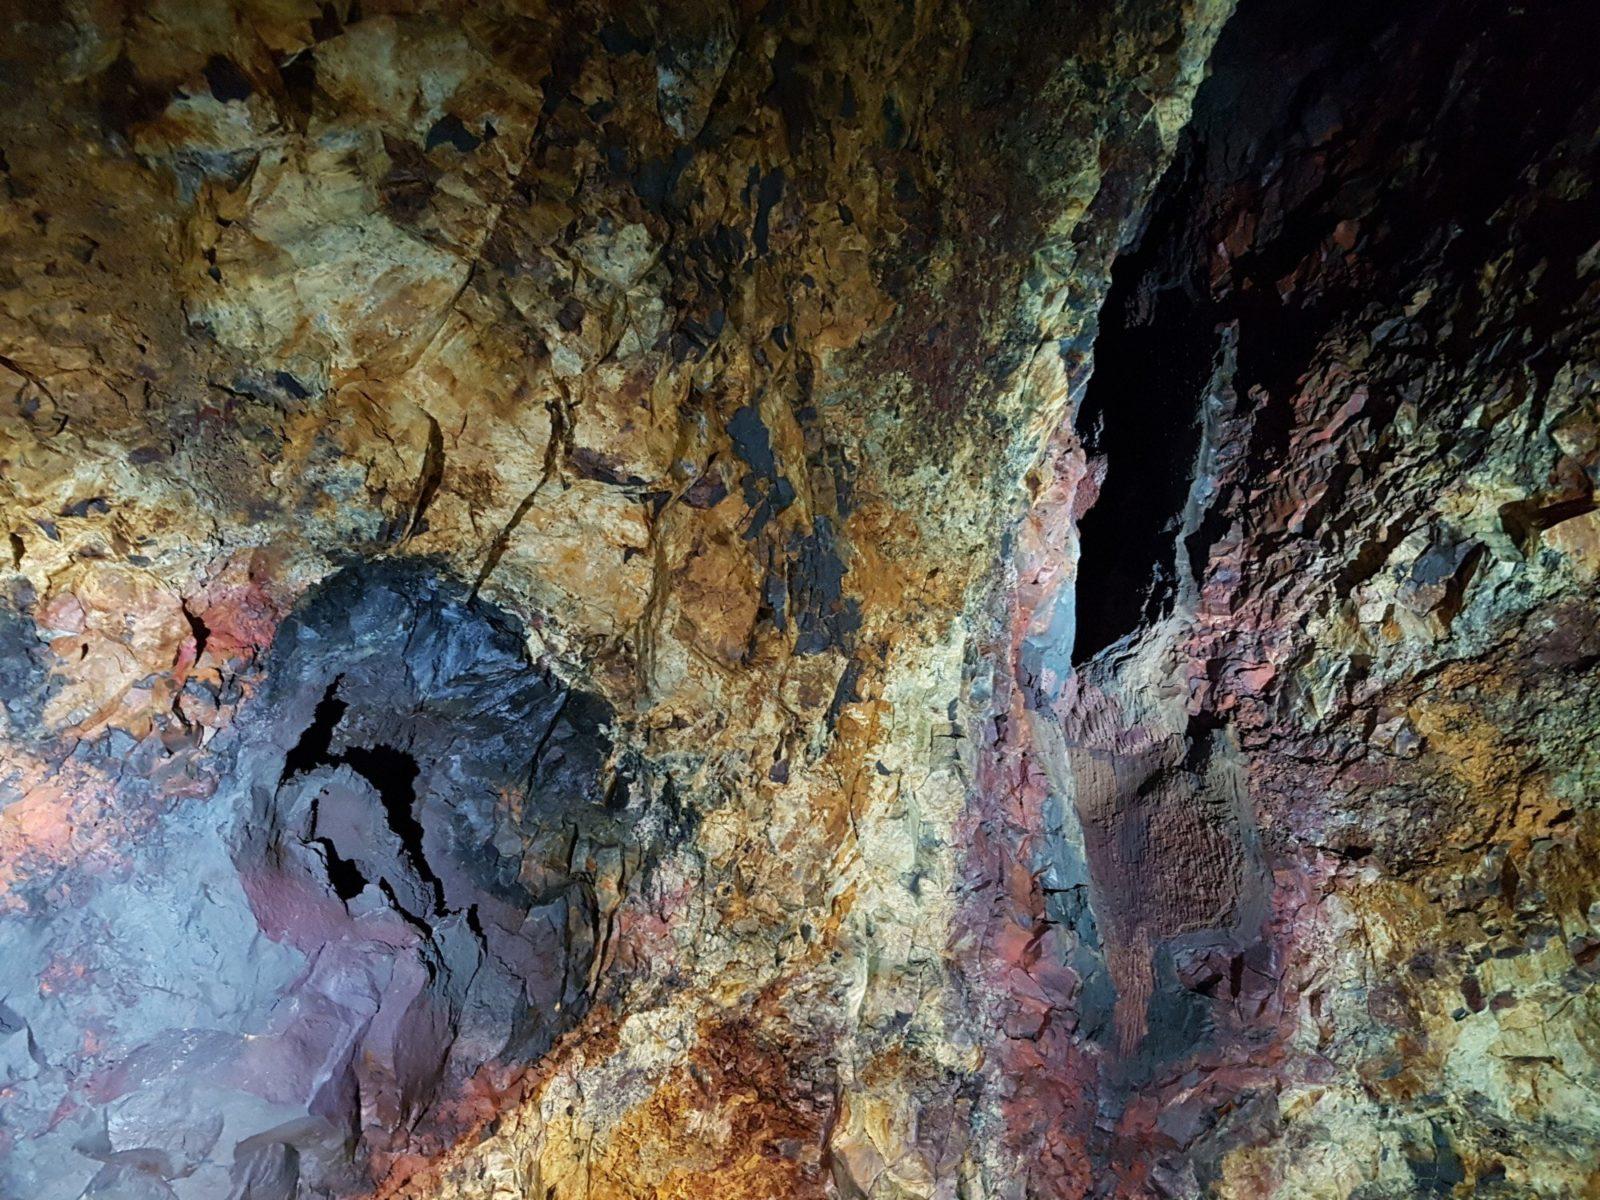 Thrihnukagigur magma chamber in Iceland.